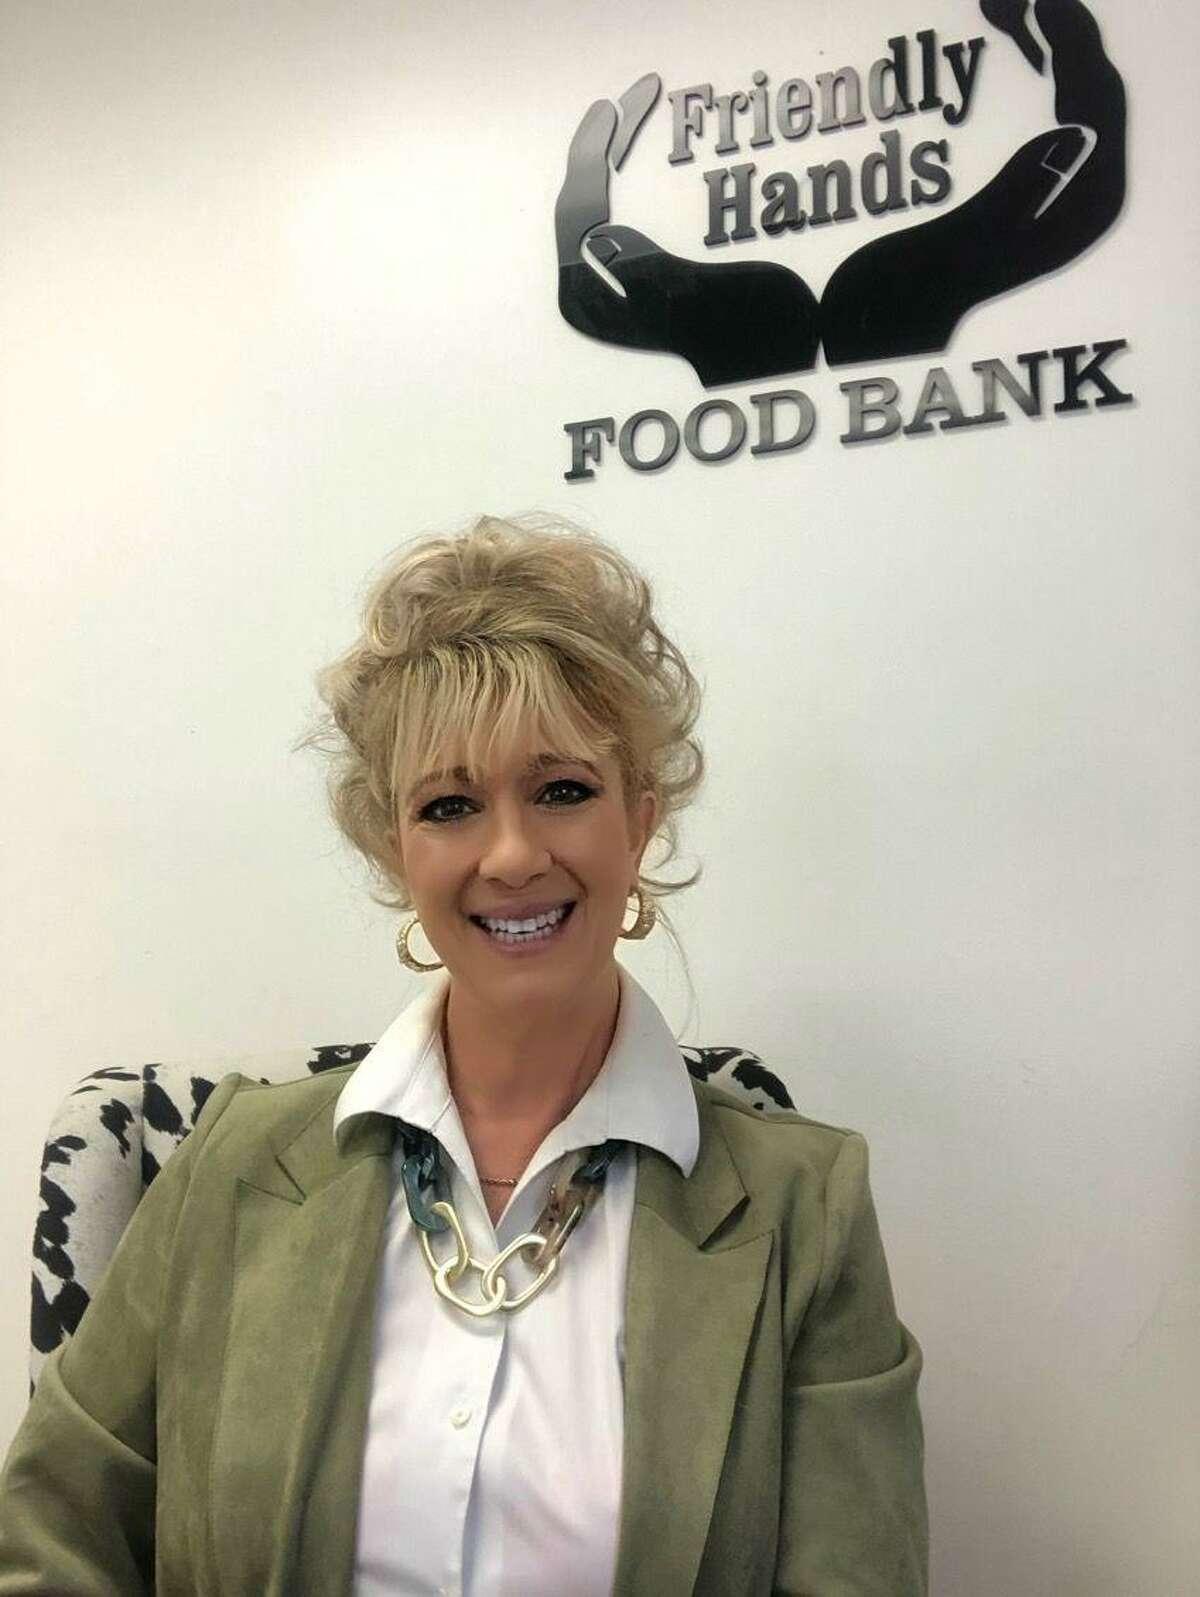 Karen Thomas, the executive director of Friendly Hands Food Bank.